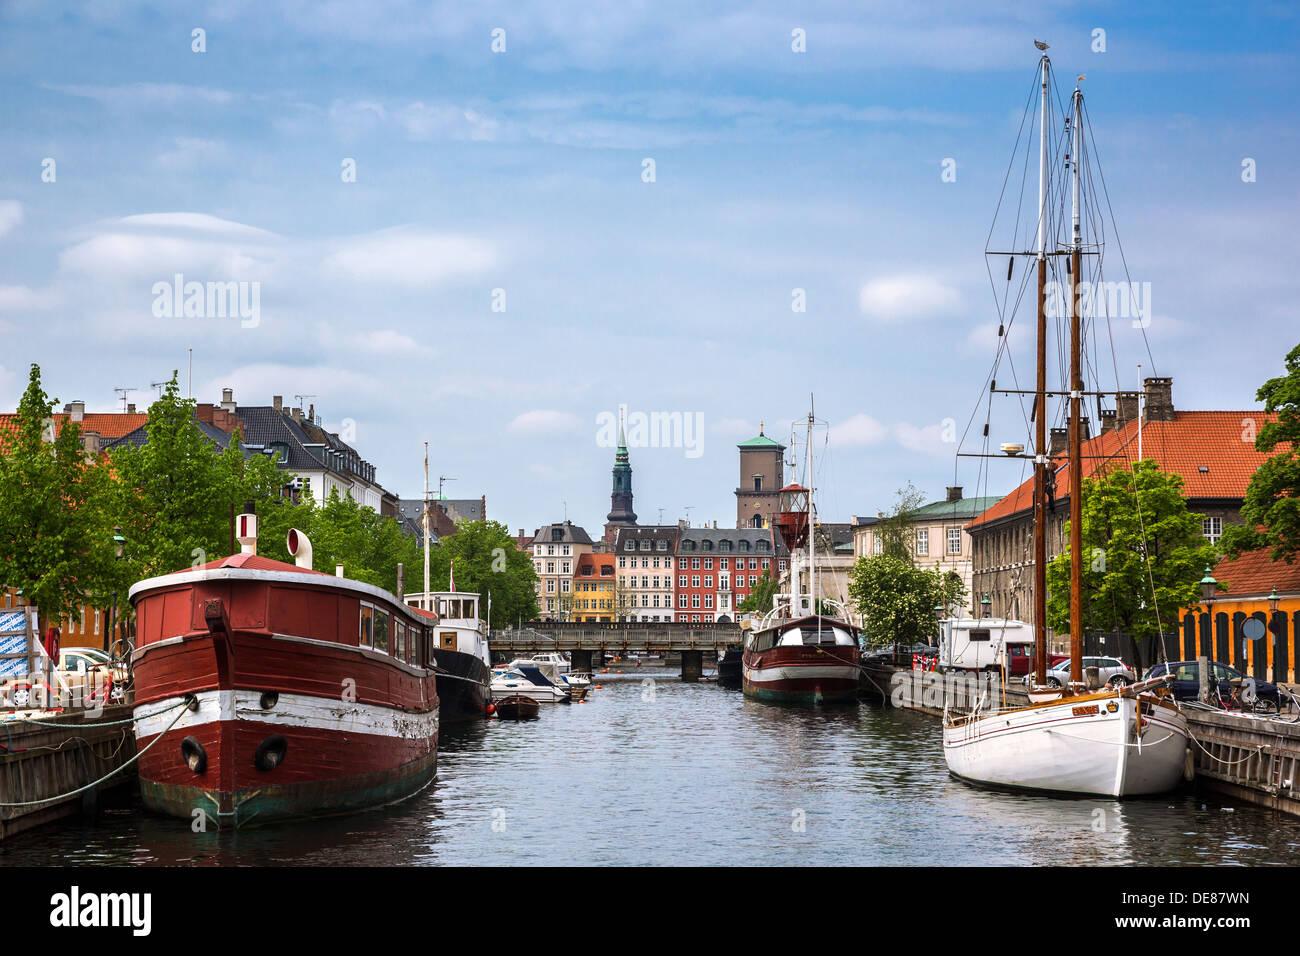 Copenhagen, Denmark, in the view of Christians Brygge Frederiksholms channel - Stock Image